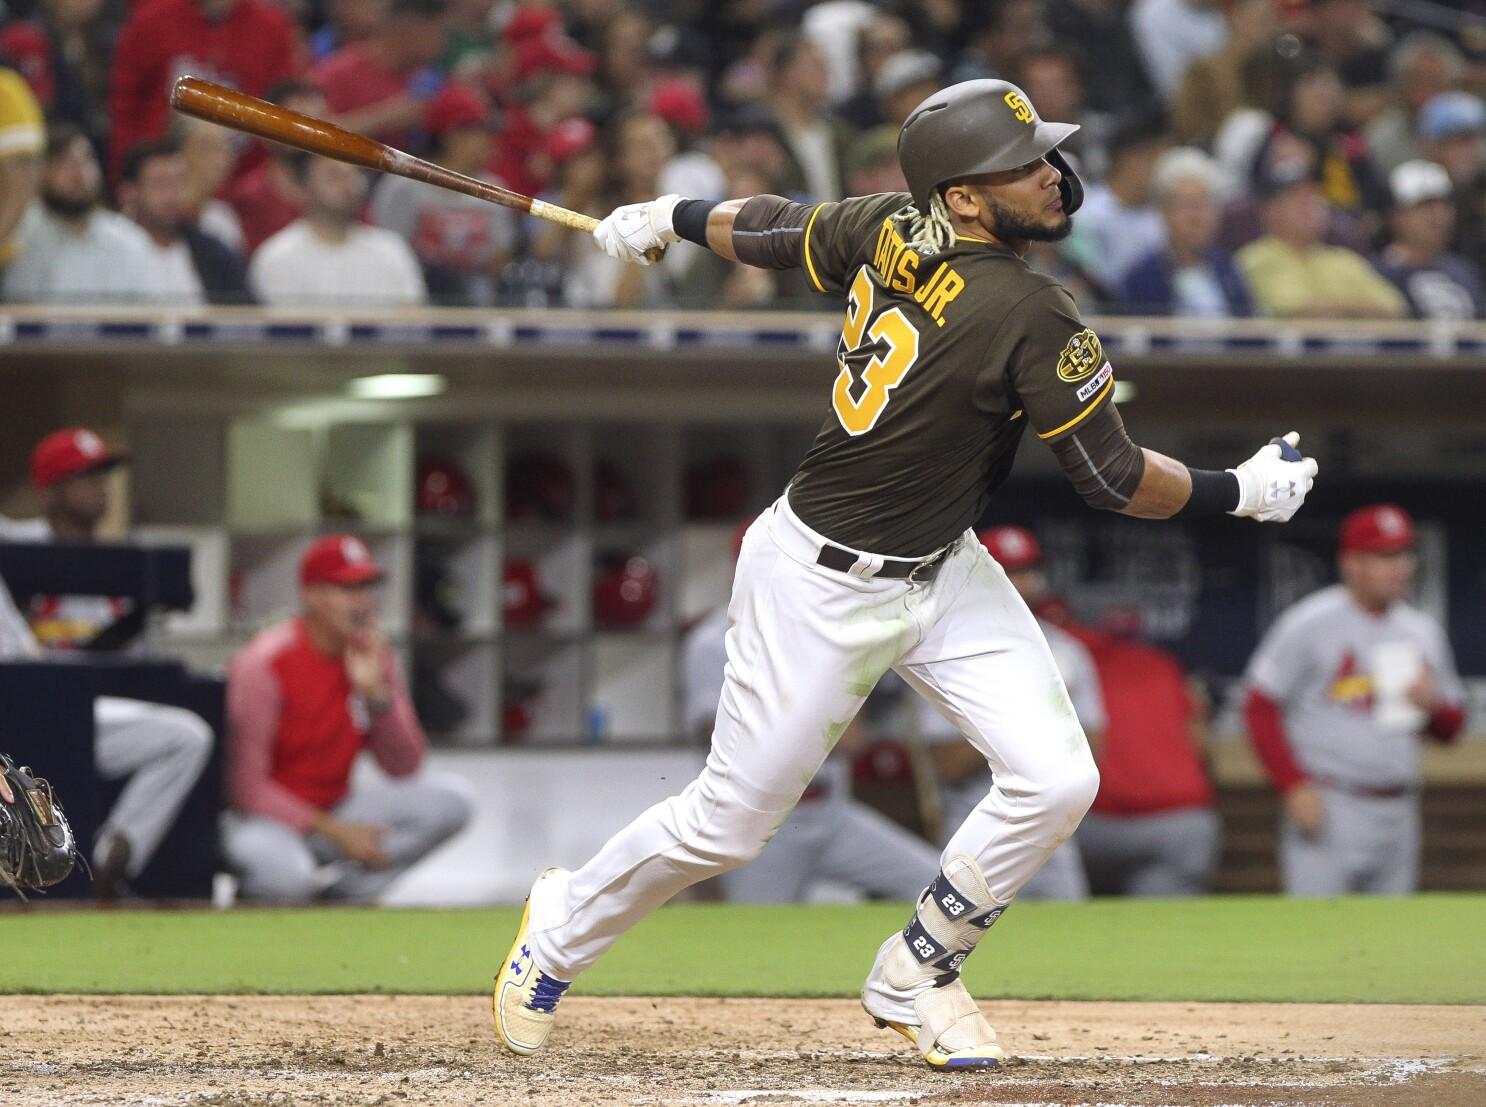 Padres' Fernando Tatis Jr. breaking through rookie wall - The San Diego  Union-Tribune